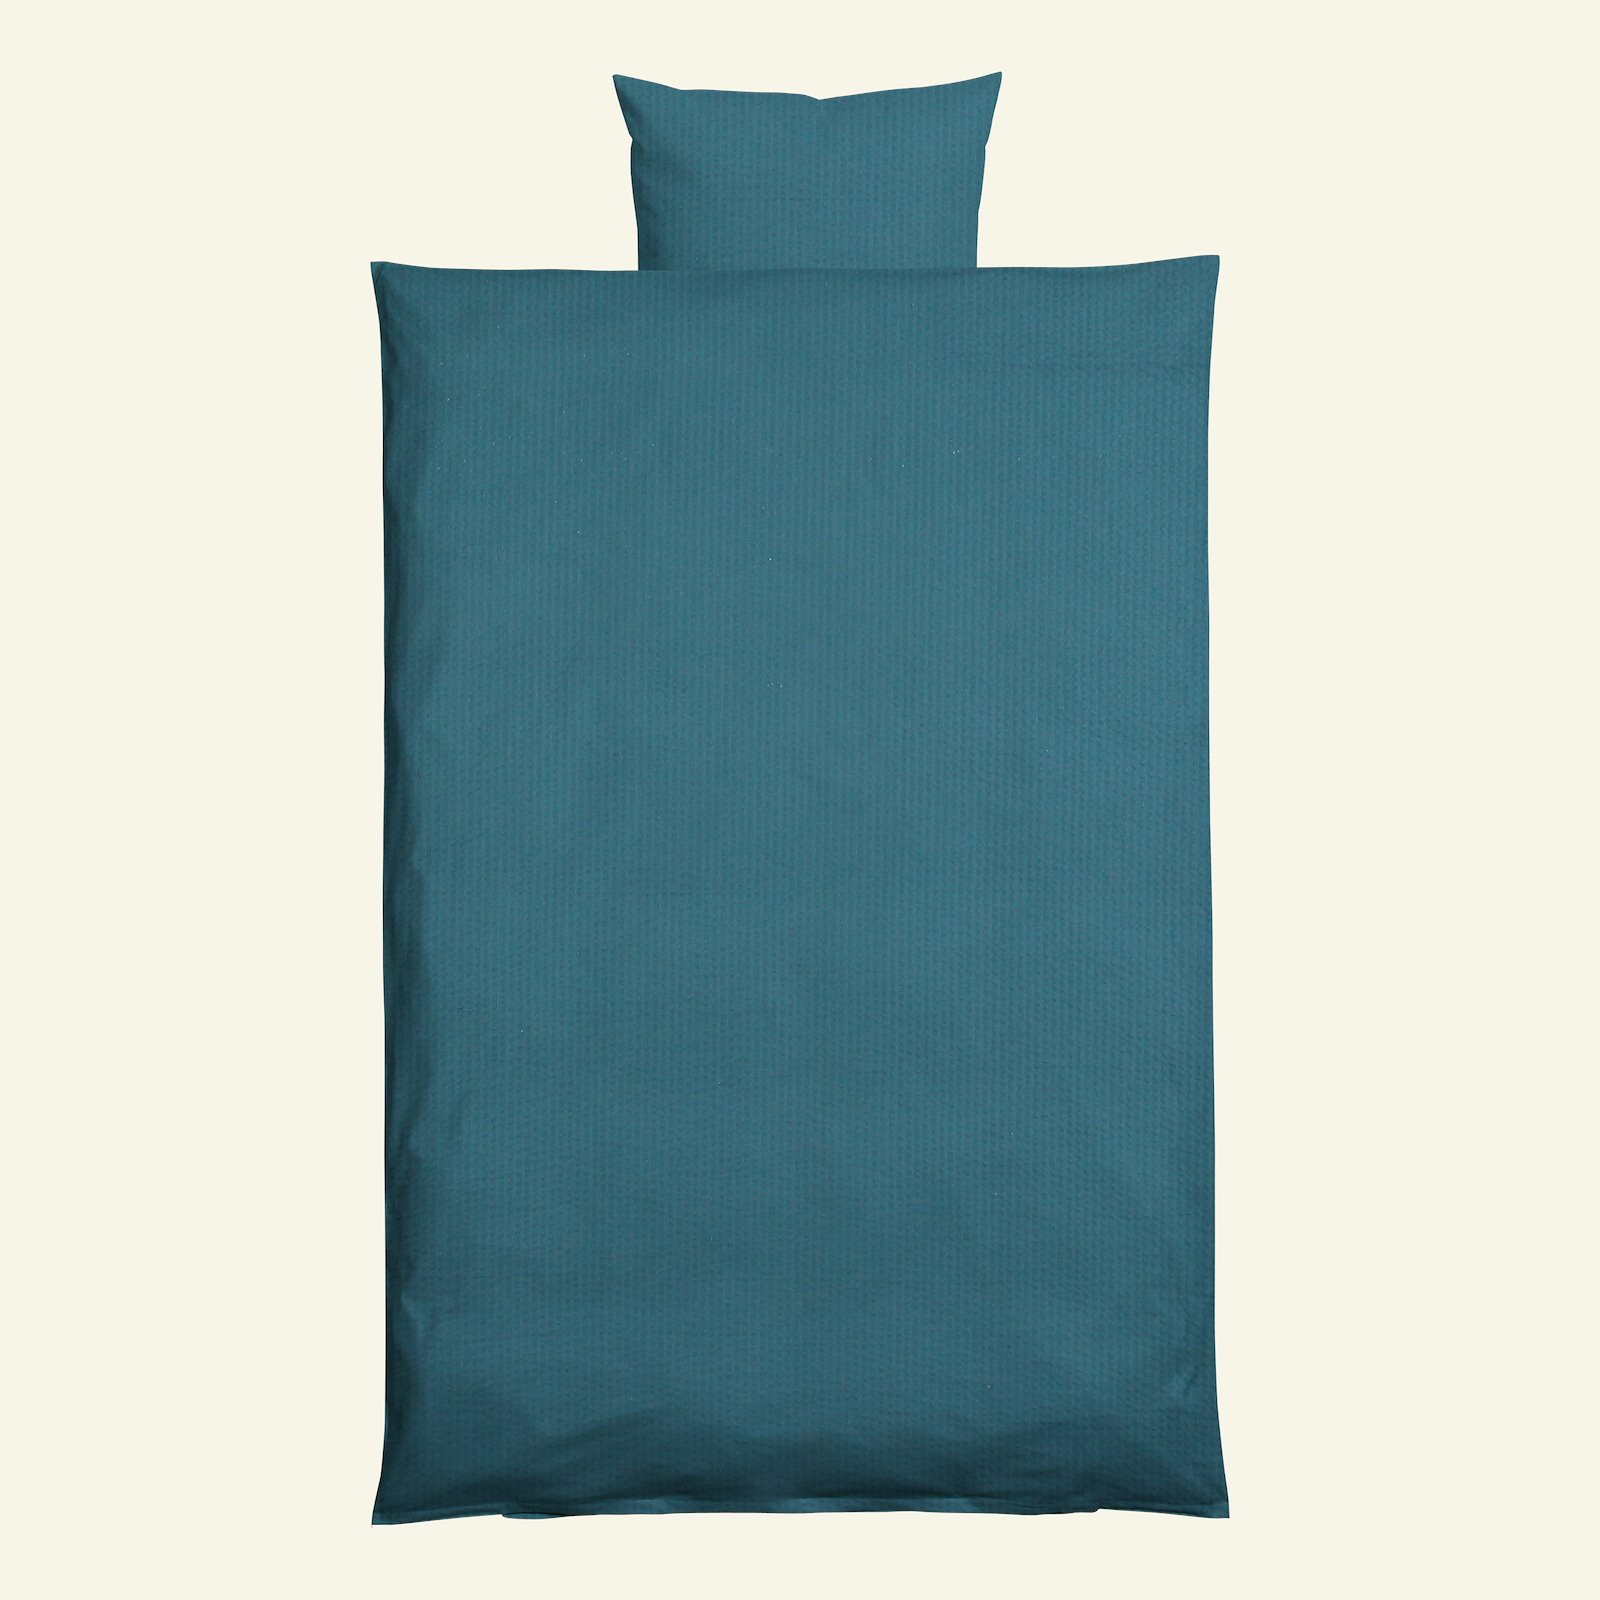 Bed linen p90076_580069_sskit